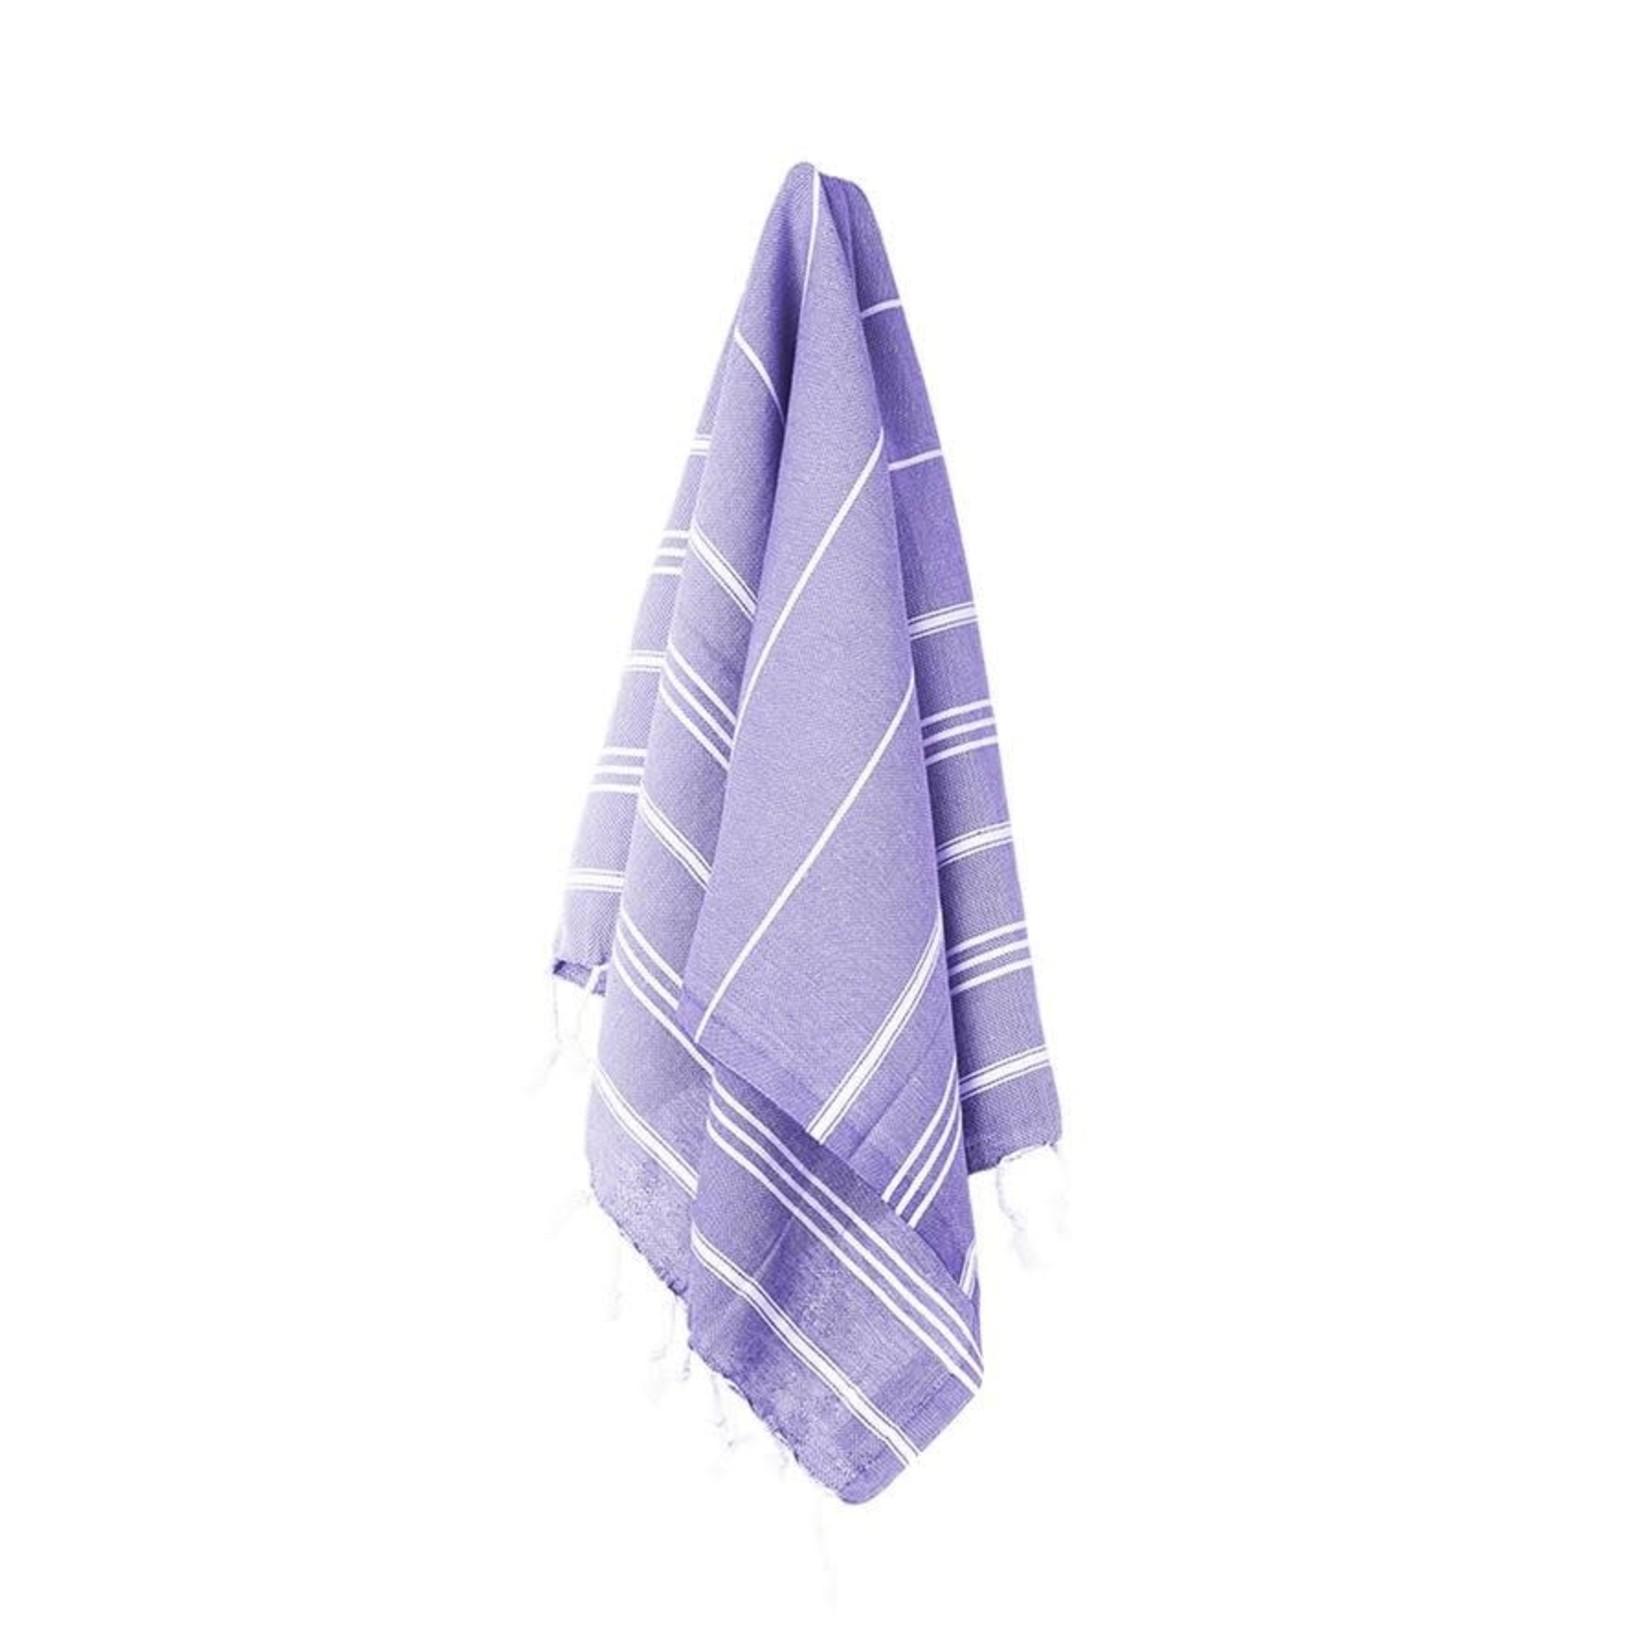 STRAY + WANDER MARIN SMALL TOWEL - ROYAL PURPLE